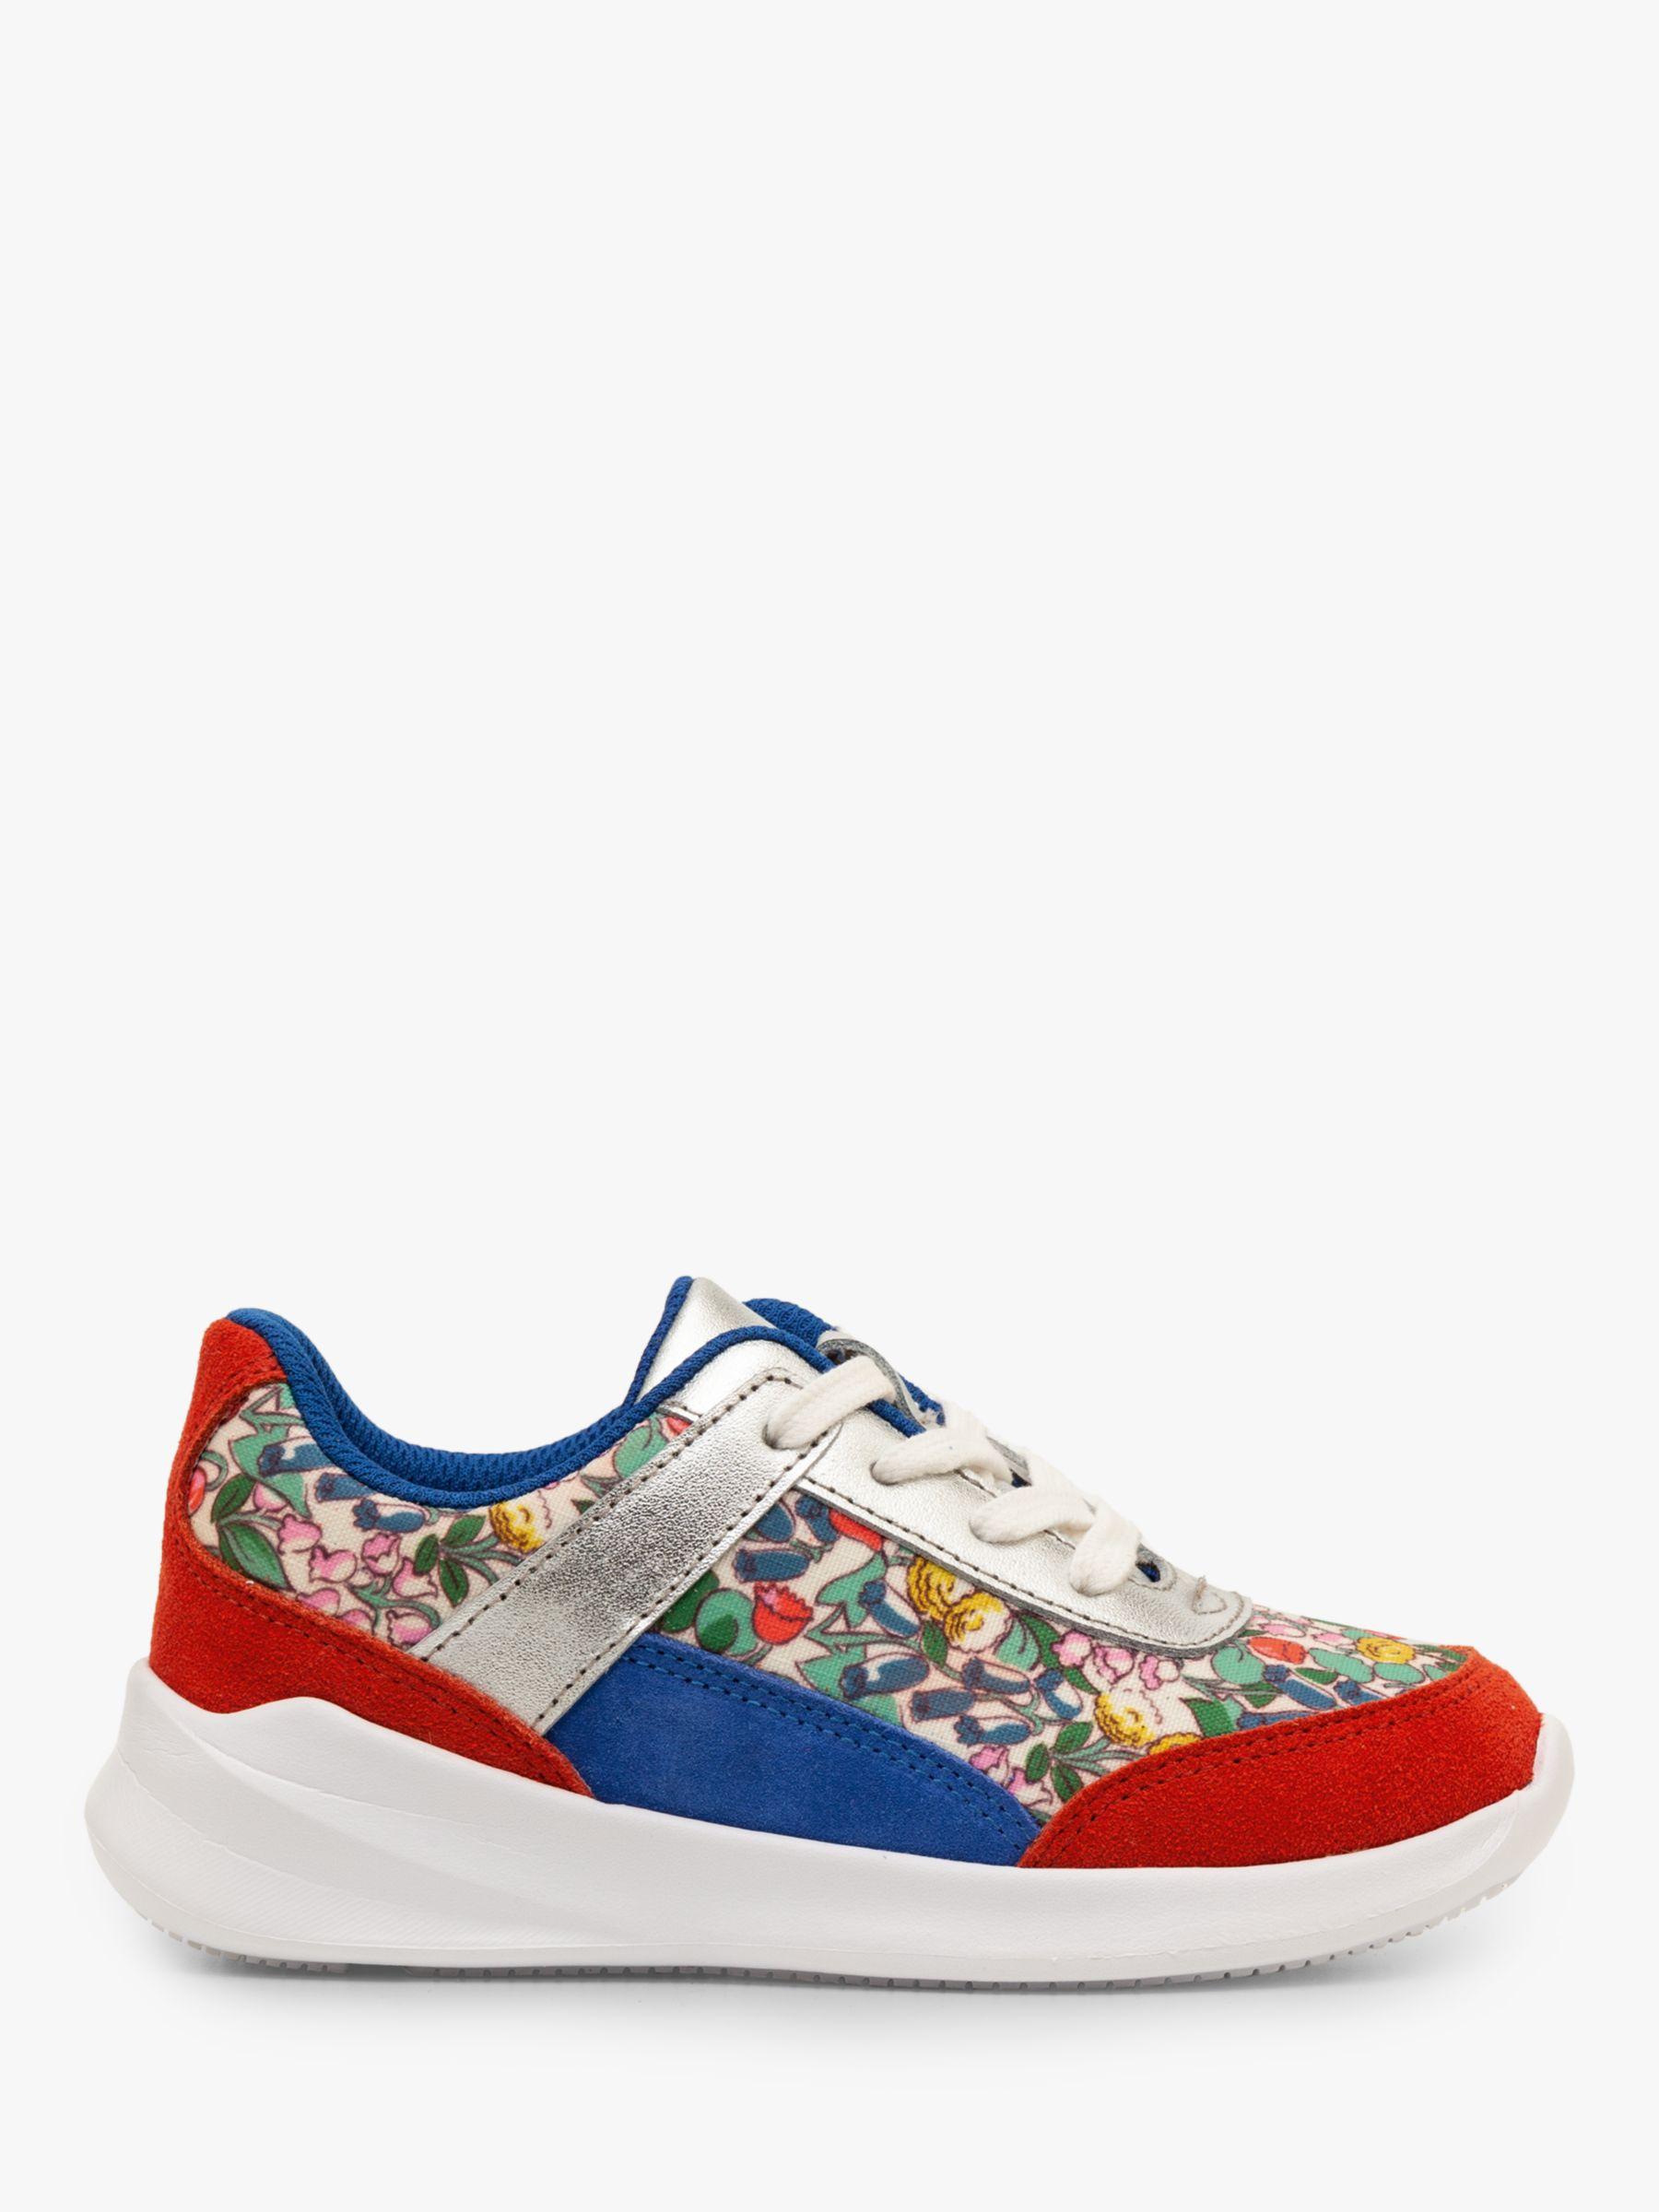 Mini Boden Mini Boden Colourblock Trainers, Ivory Spring Floral